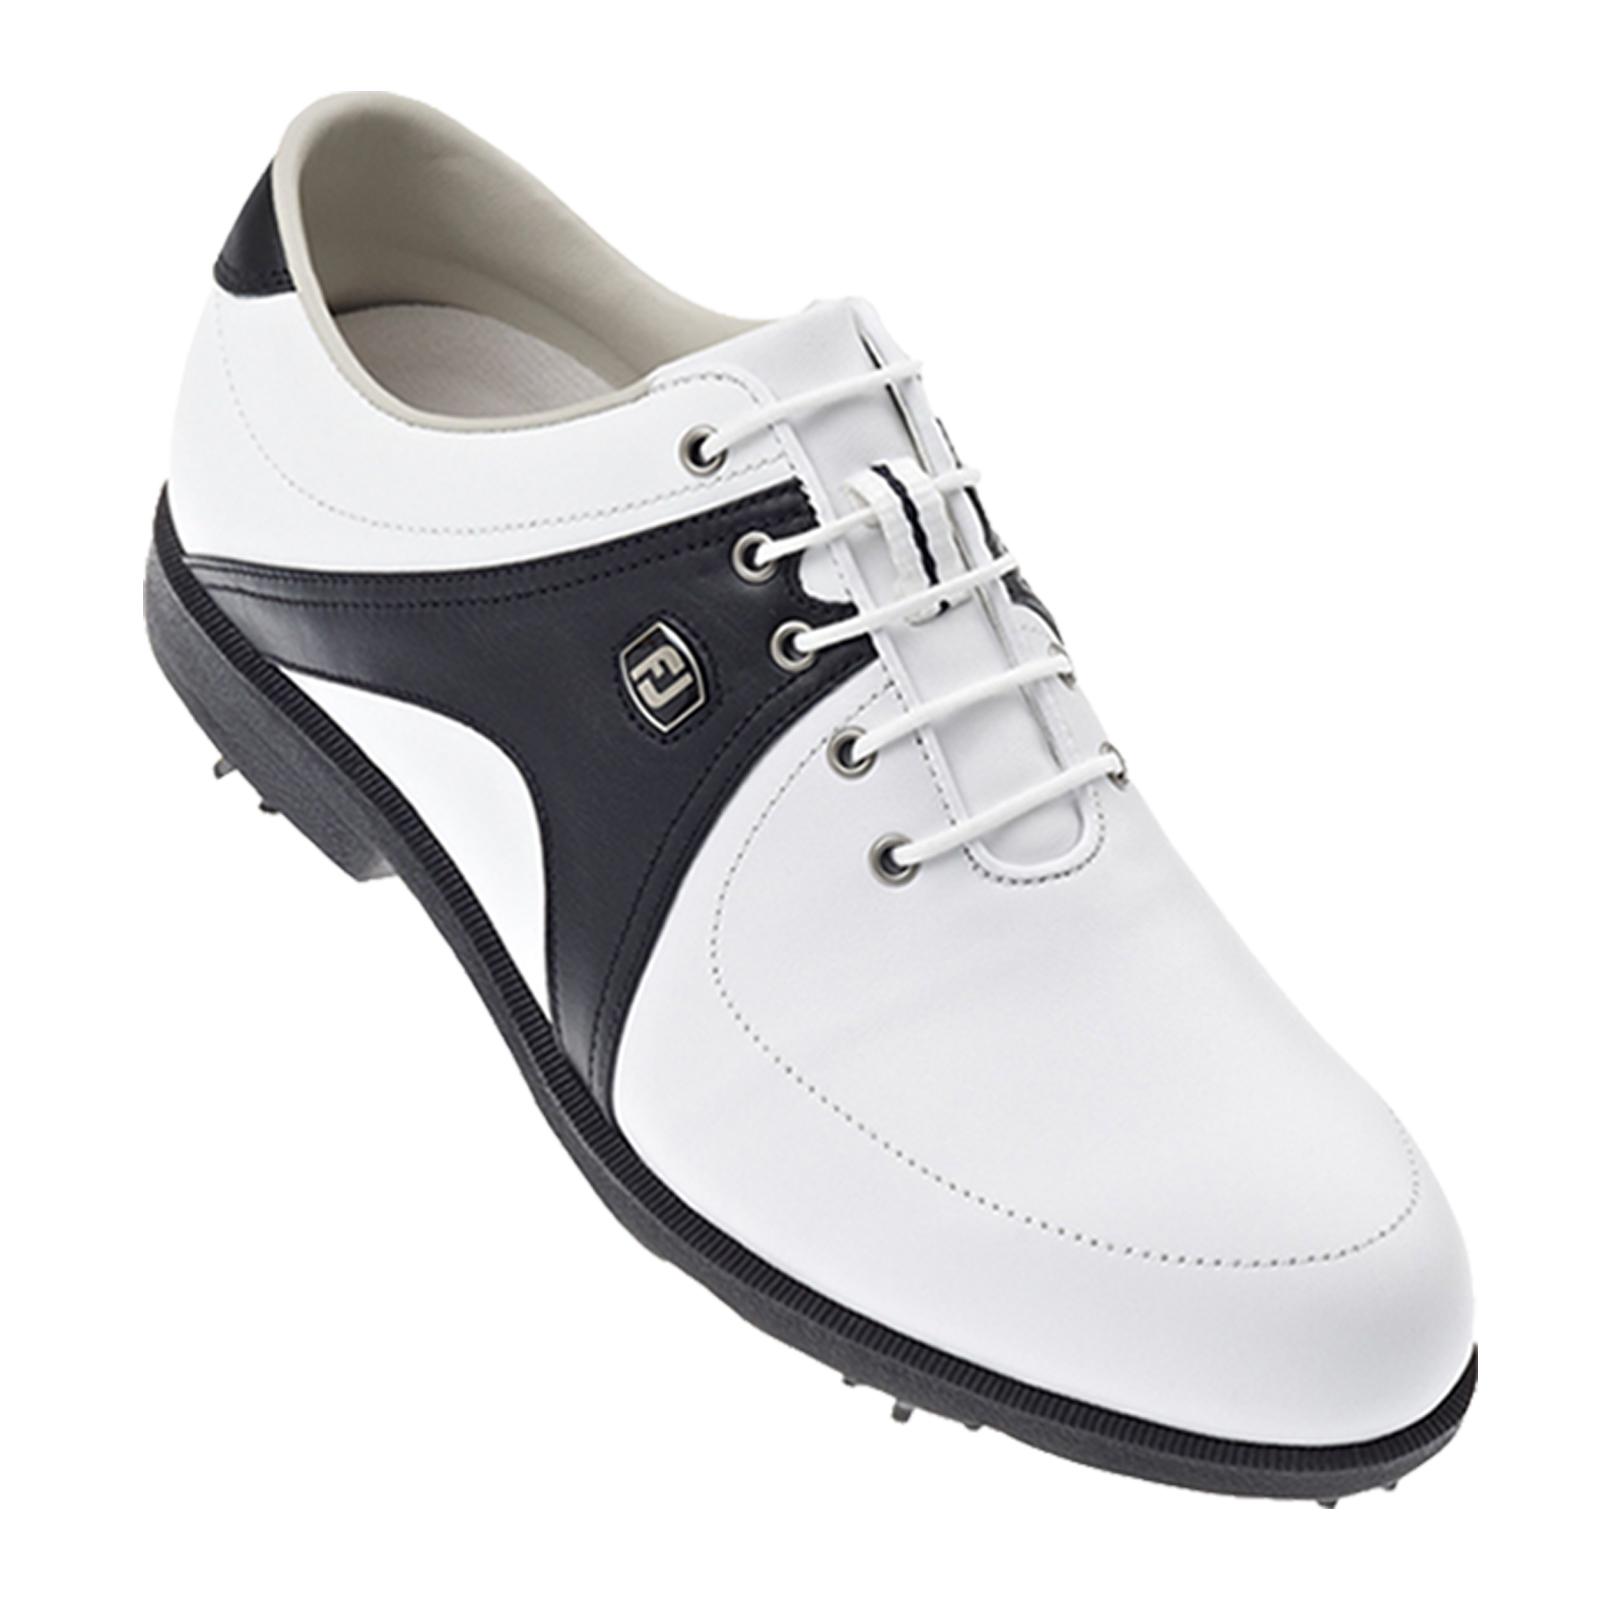 footjoy aql golf shoes new womens fj leather